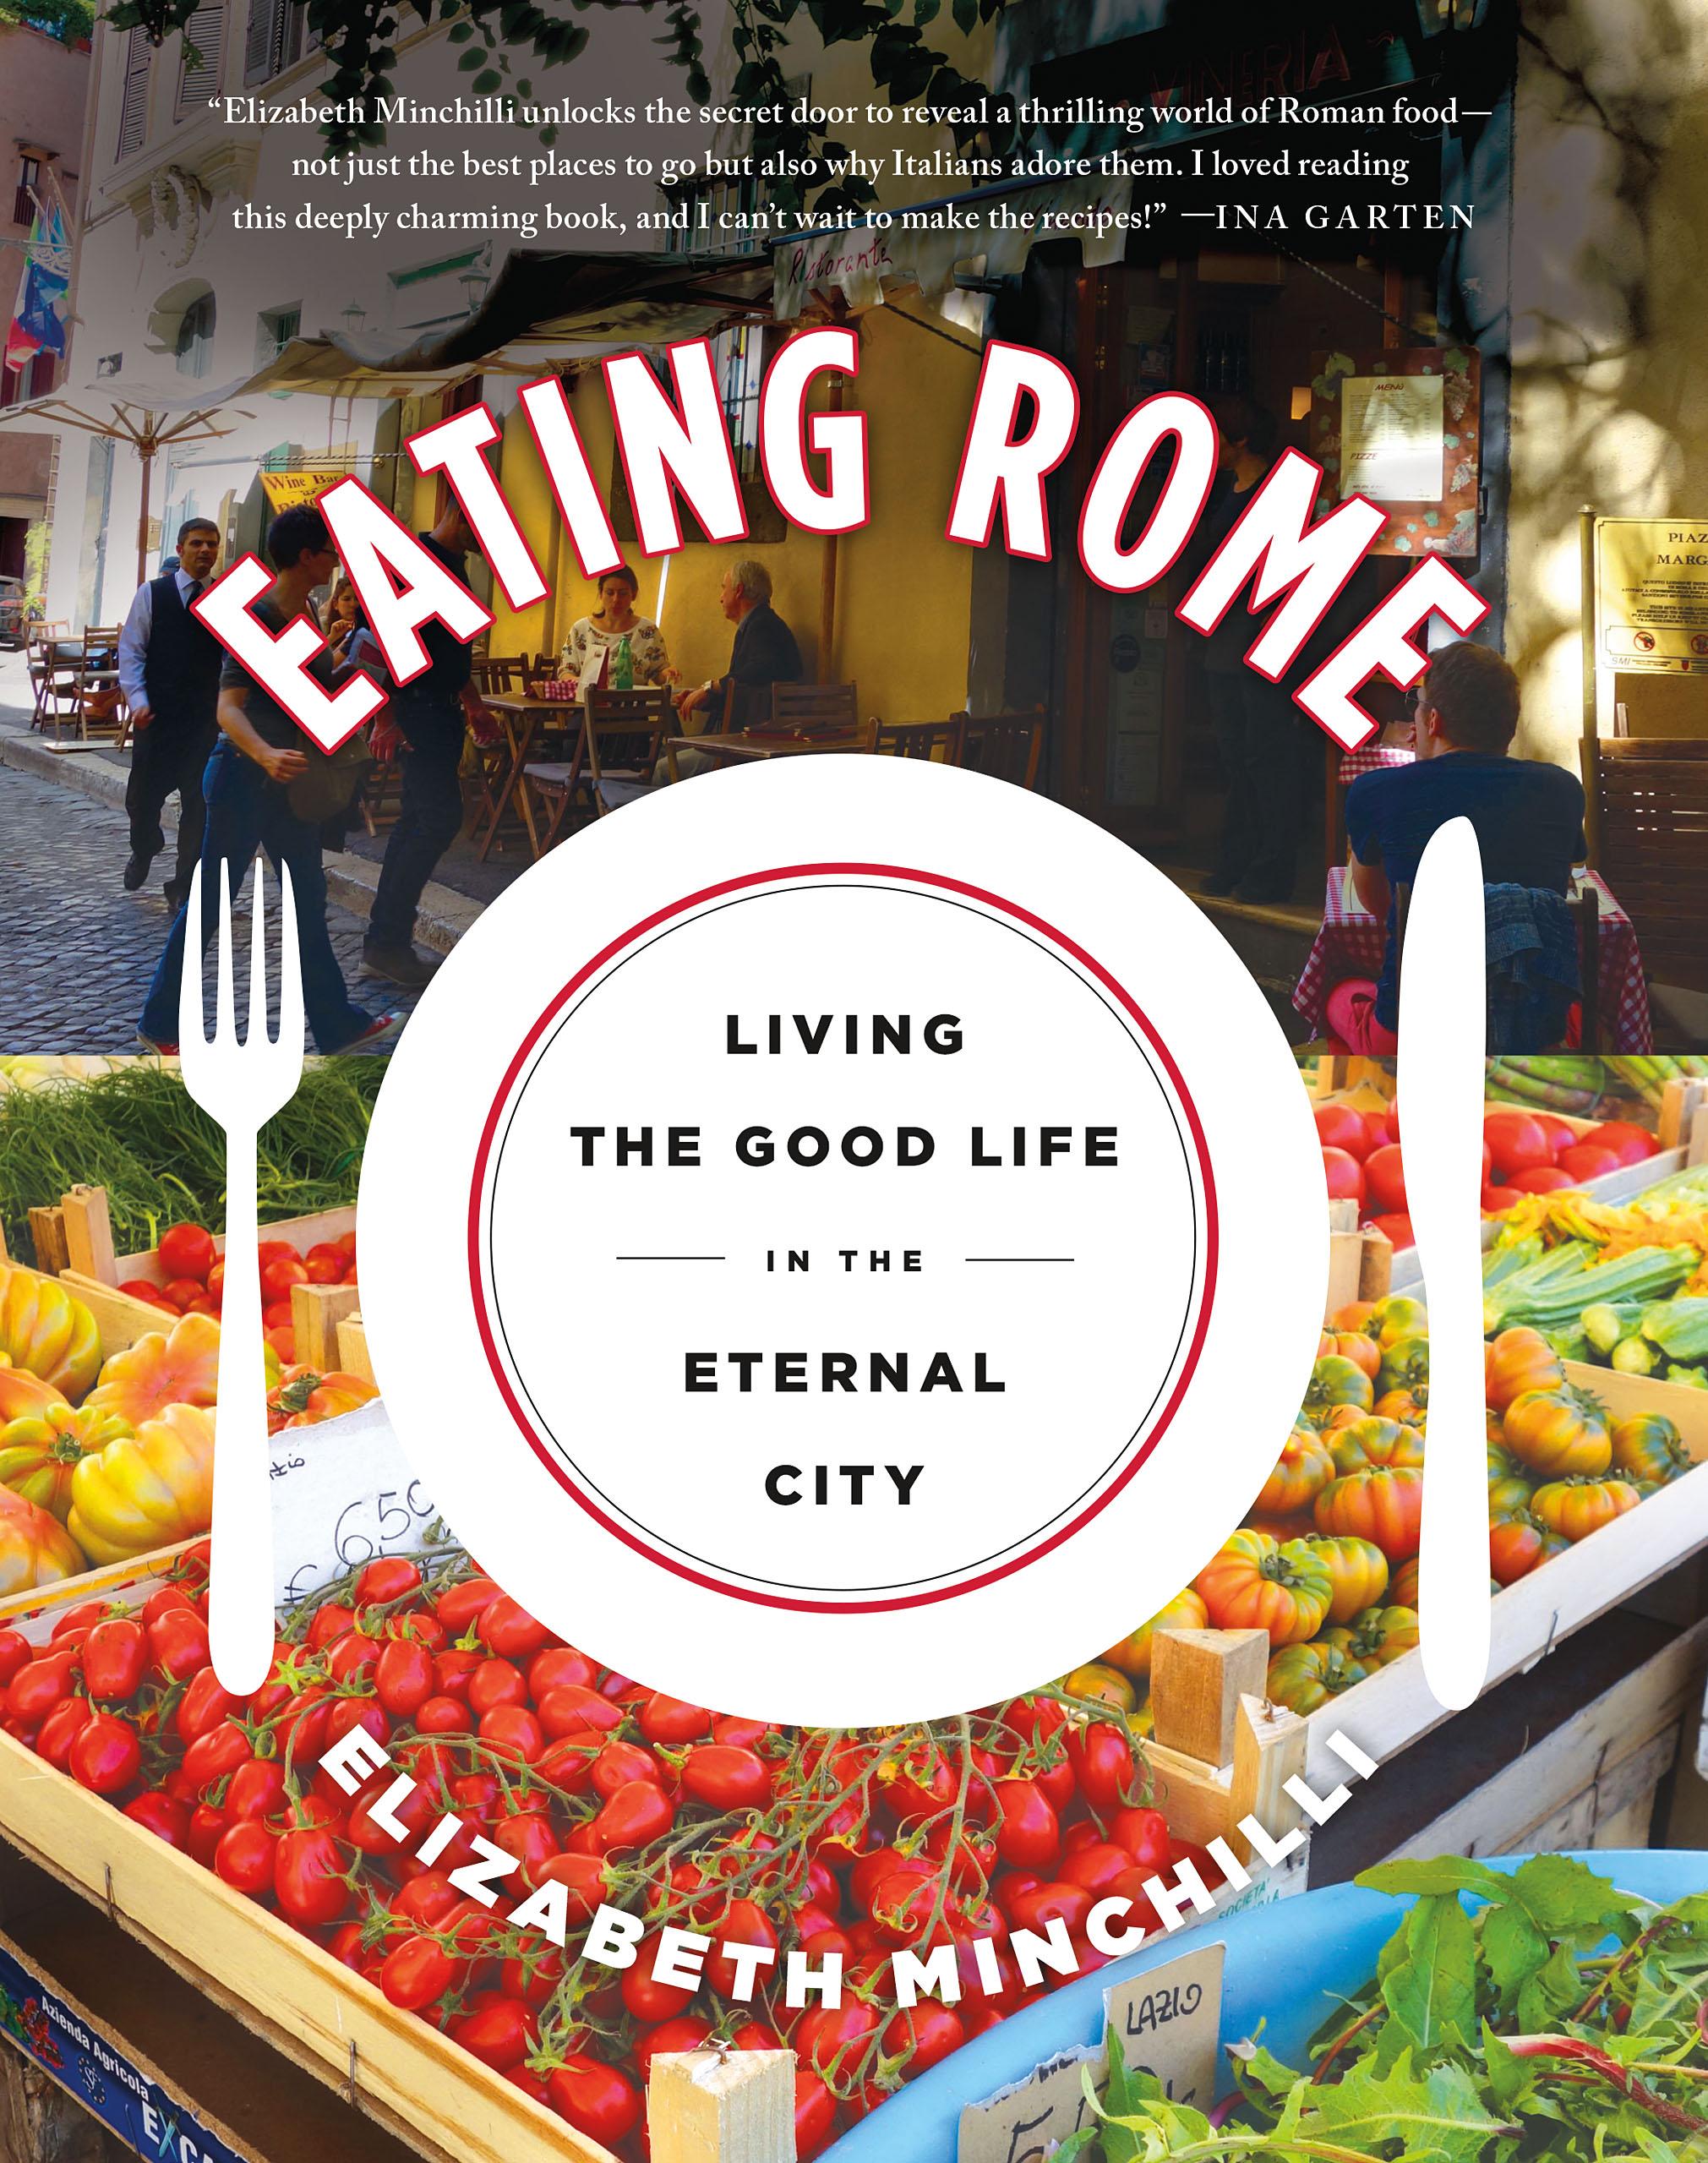 I loved Elizabeth Minchillis new book Eating Rome